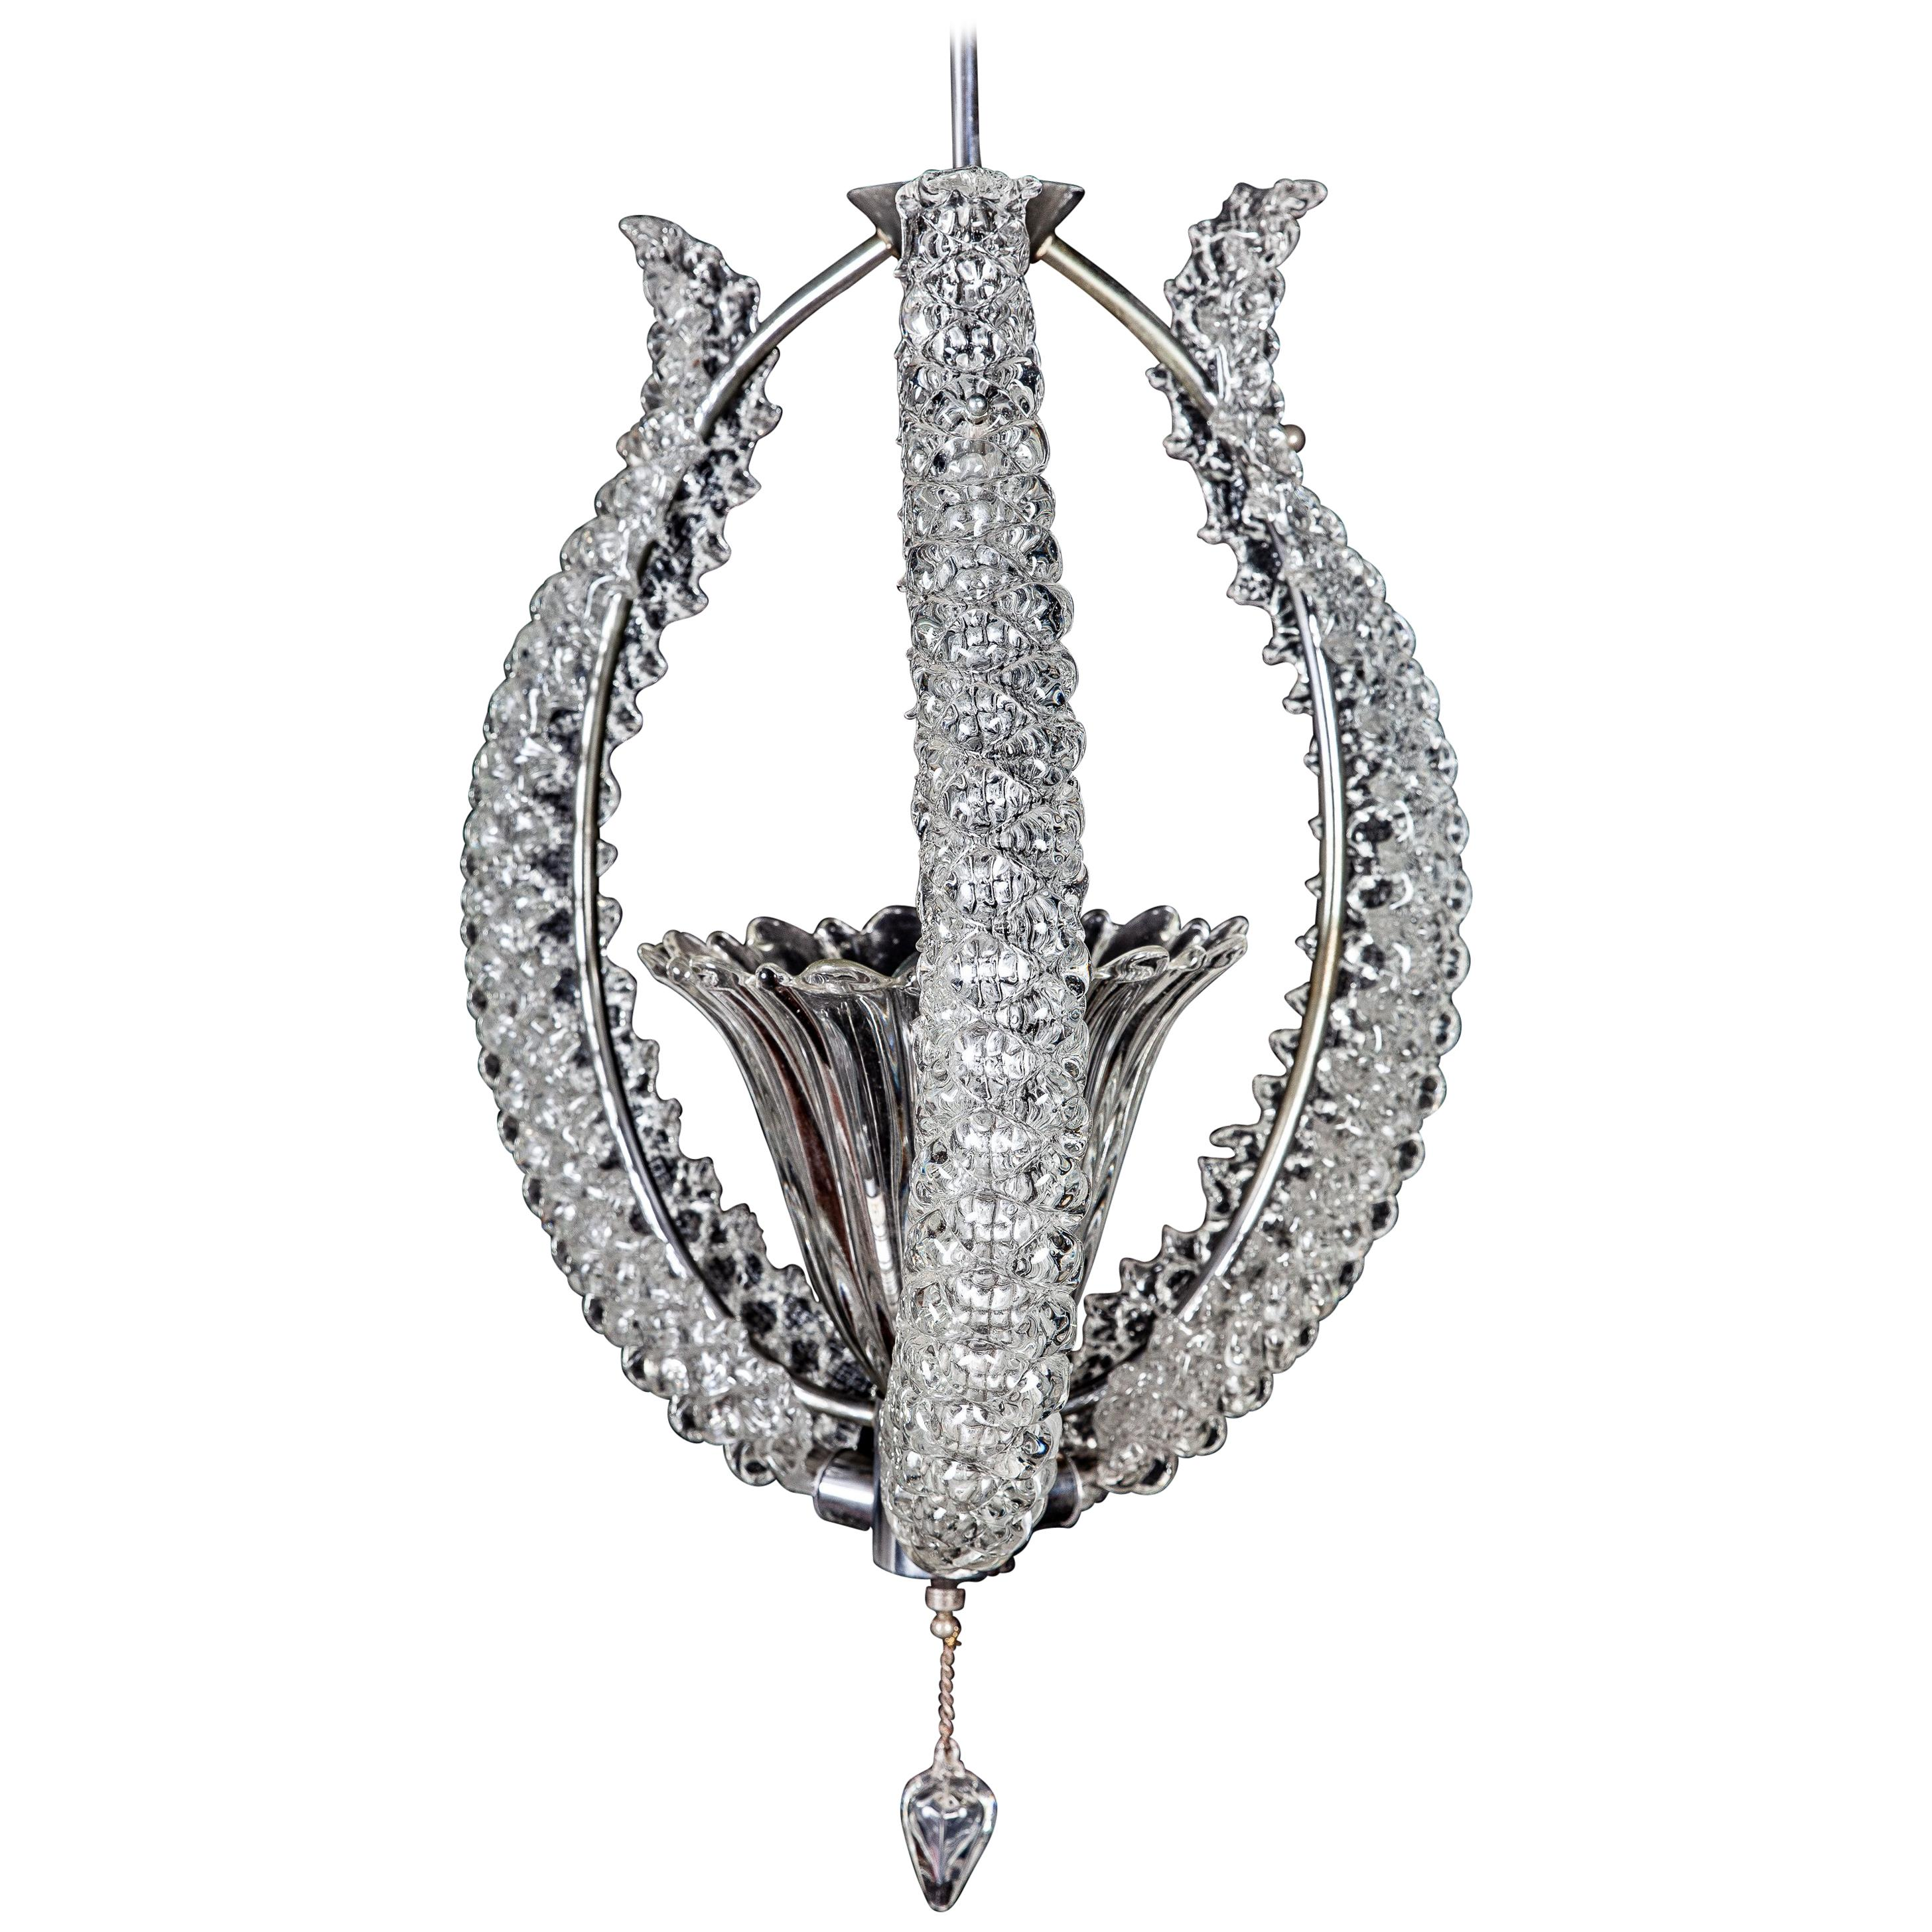 Midcentury Murano Glass Elegant Chandelier by Ercole Barovier, 1940s